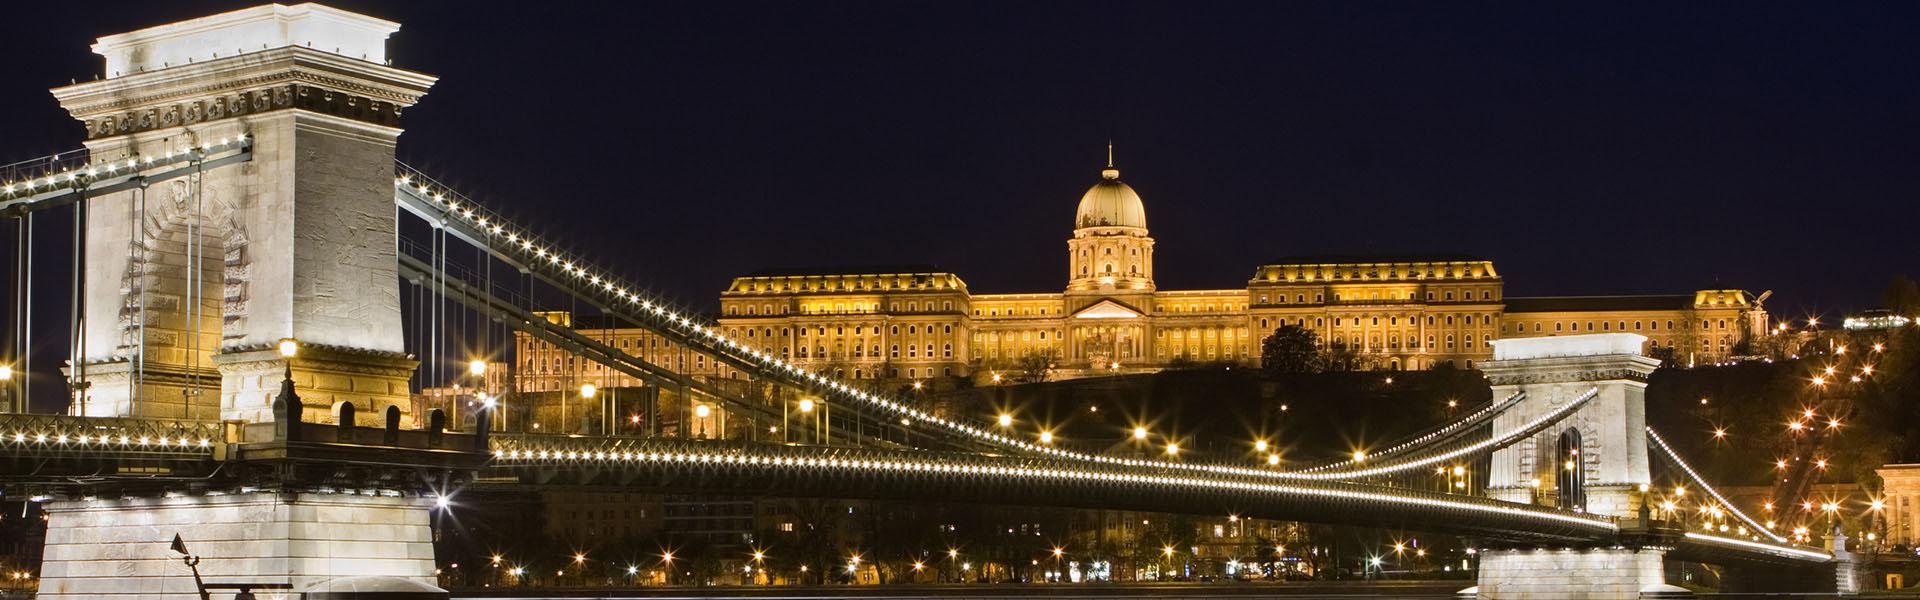 Puente De Las Cadenas Atracciones Budapest Big Bus Tours